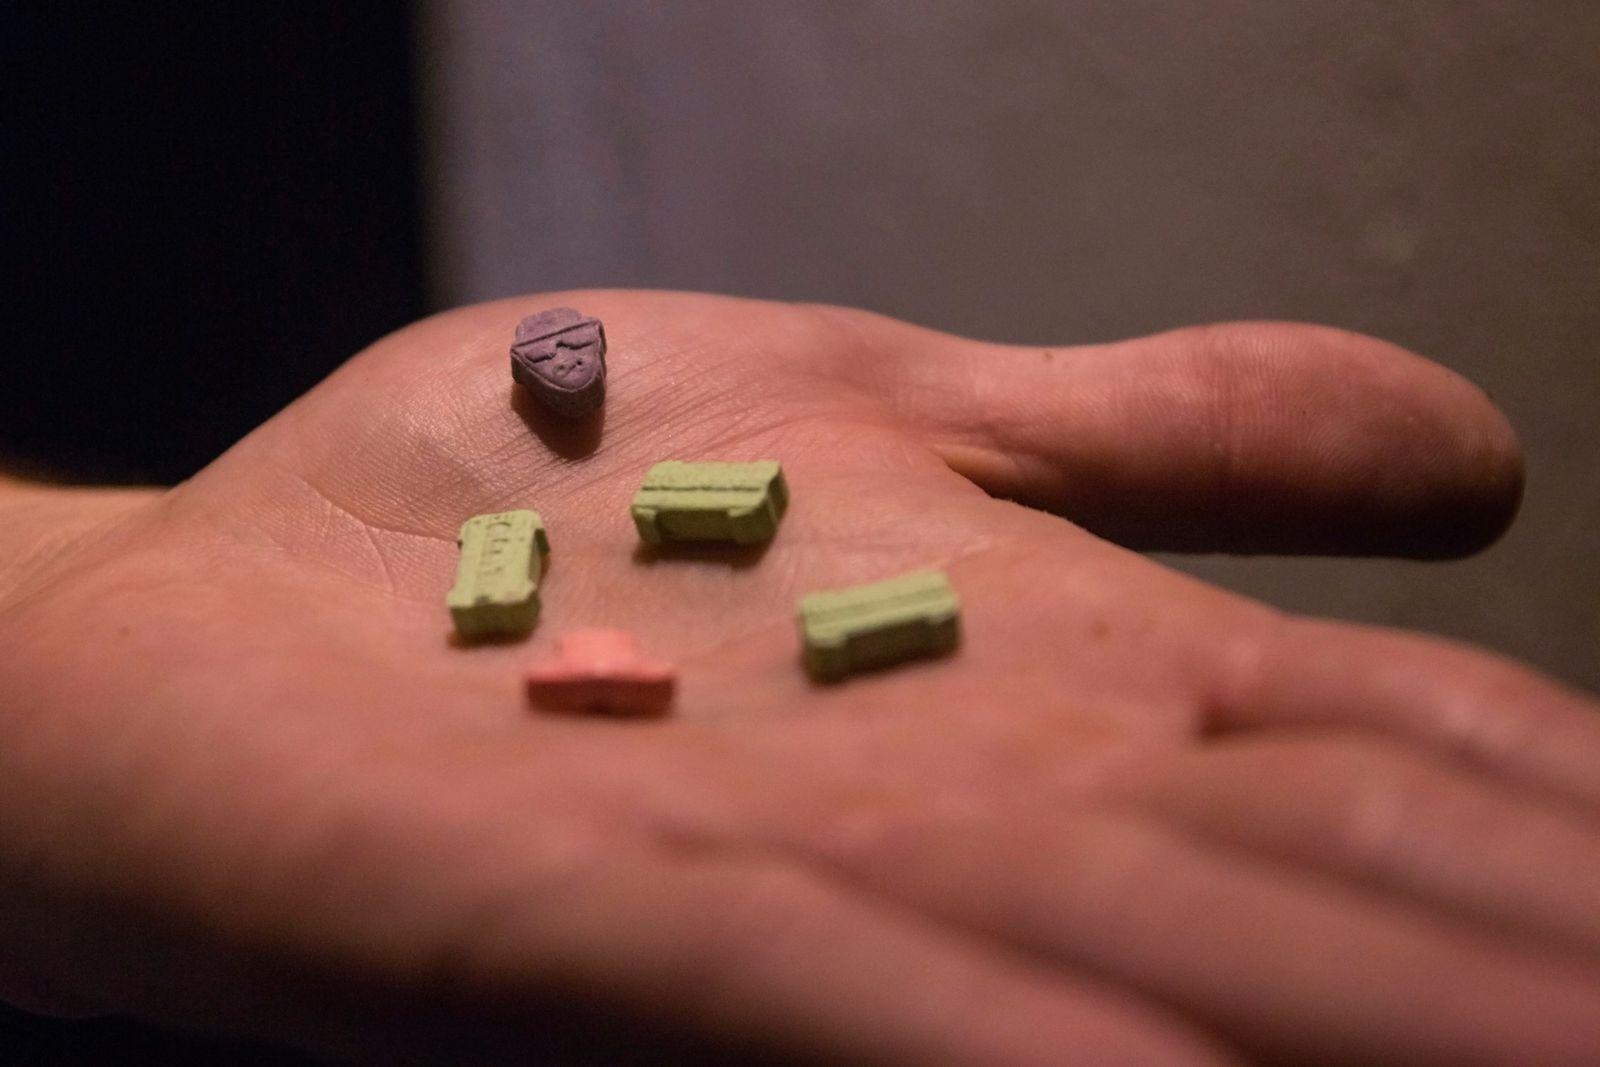 Ecstasy pills on a man's hand.